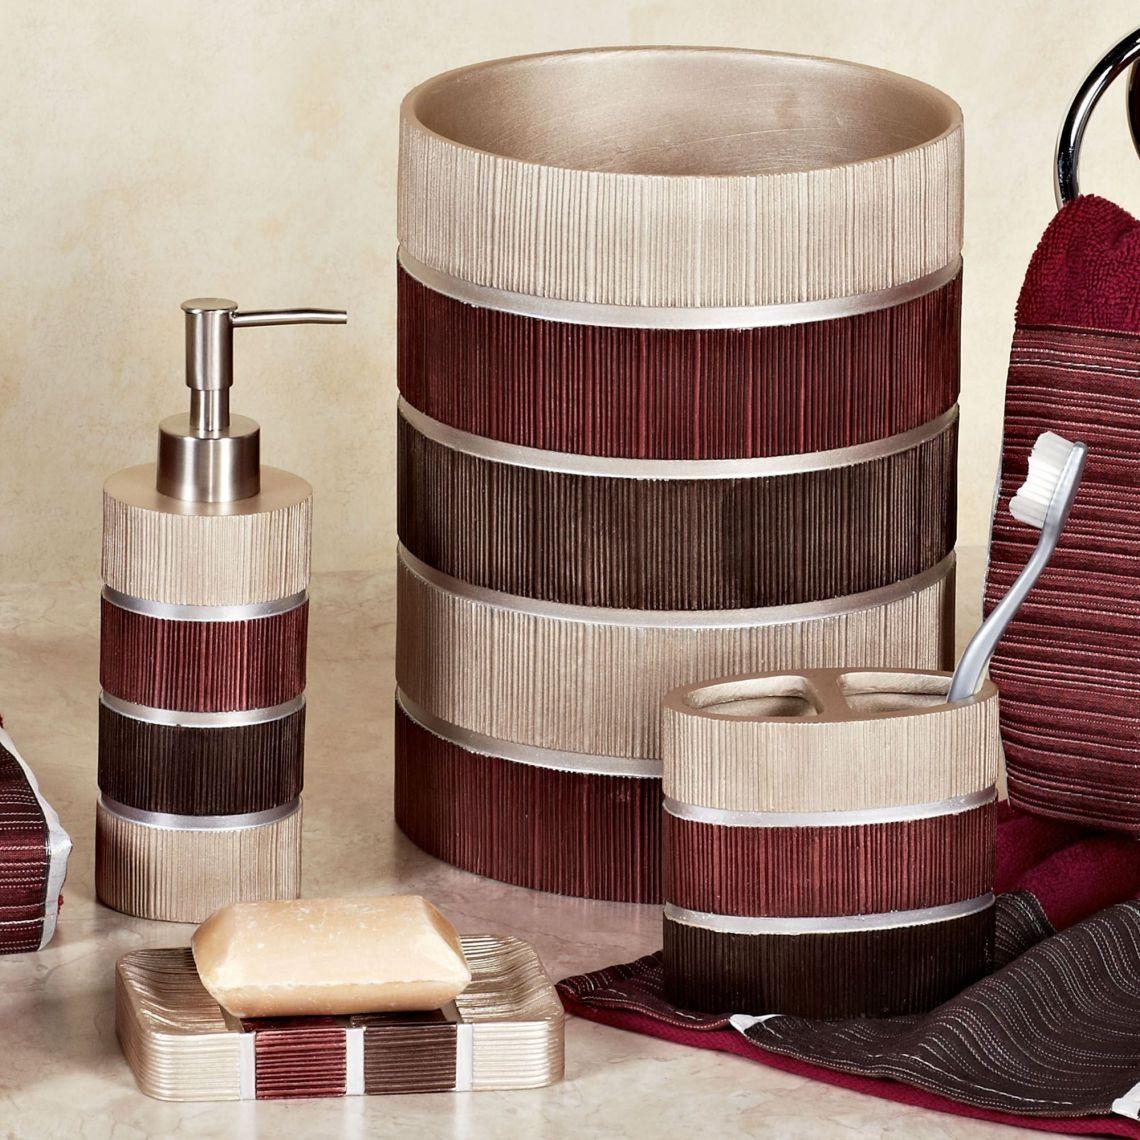 Burgundy Bath Accessory Sets | Tyres2c